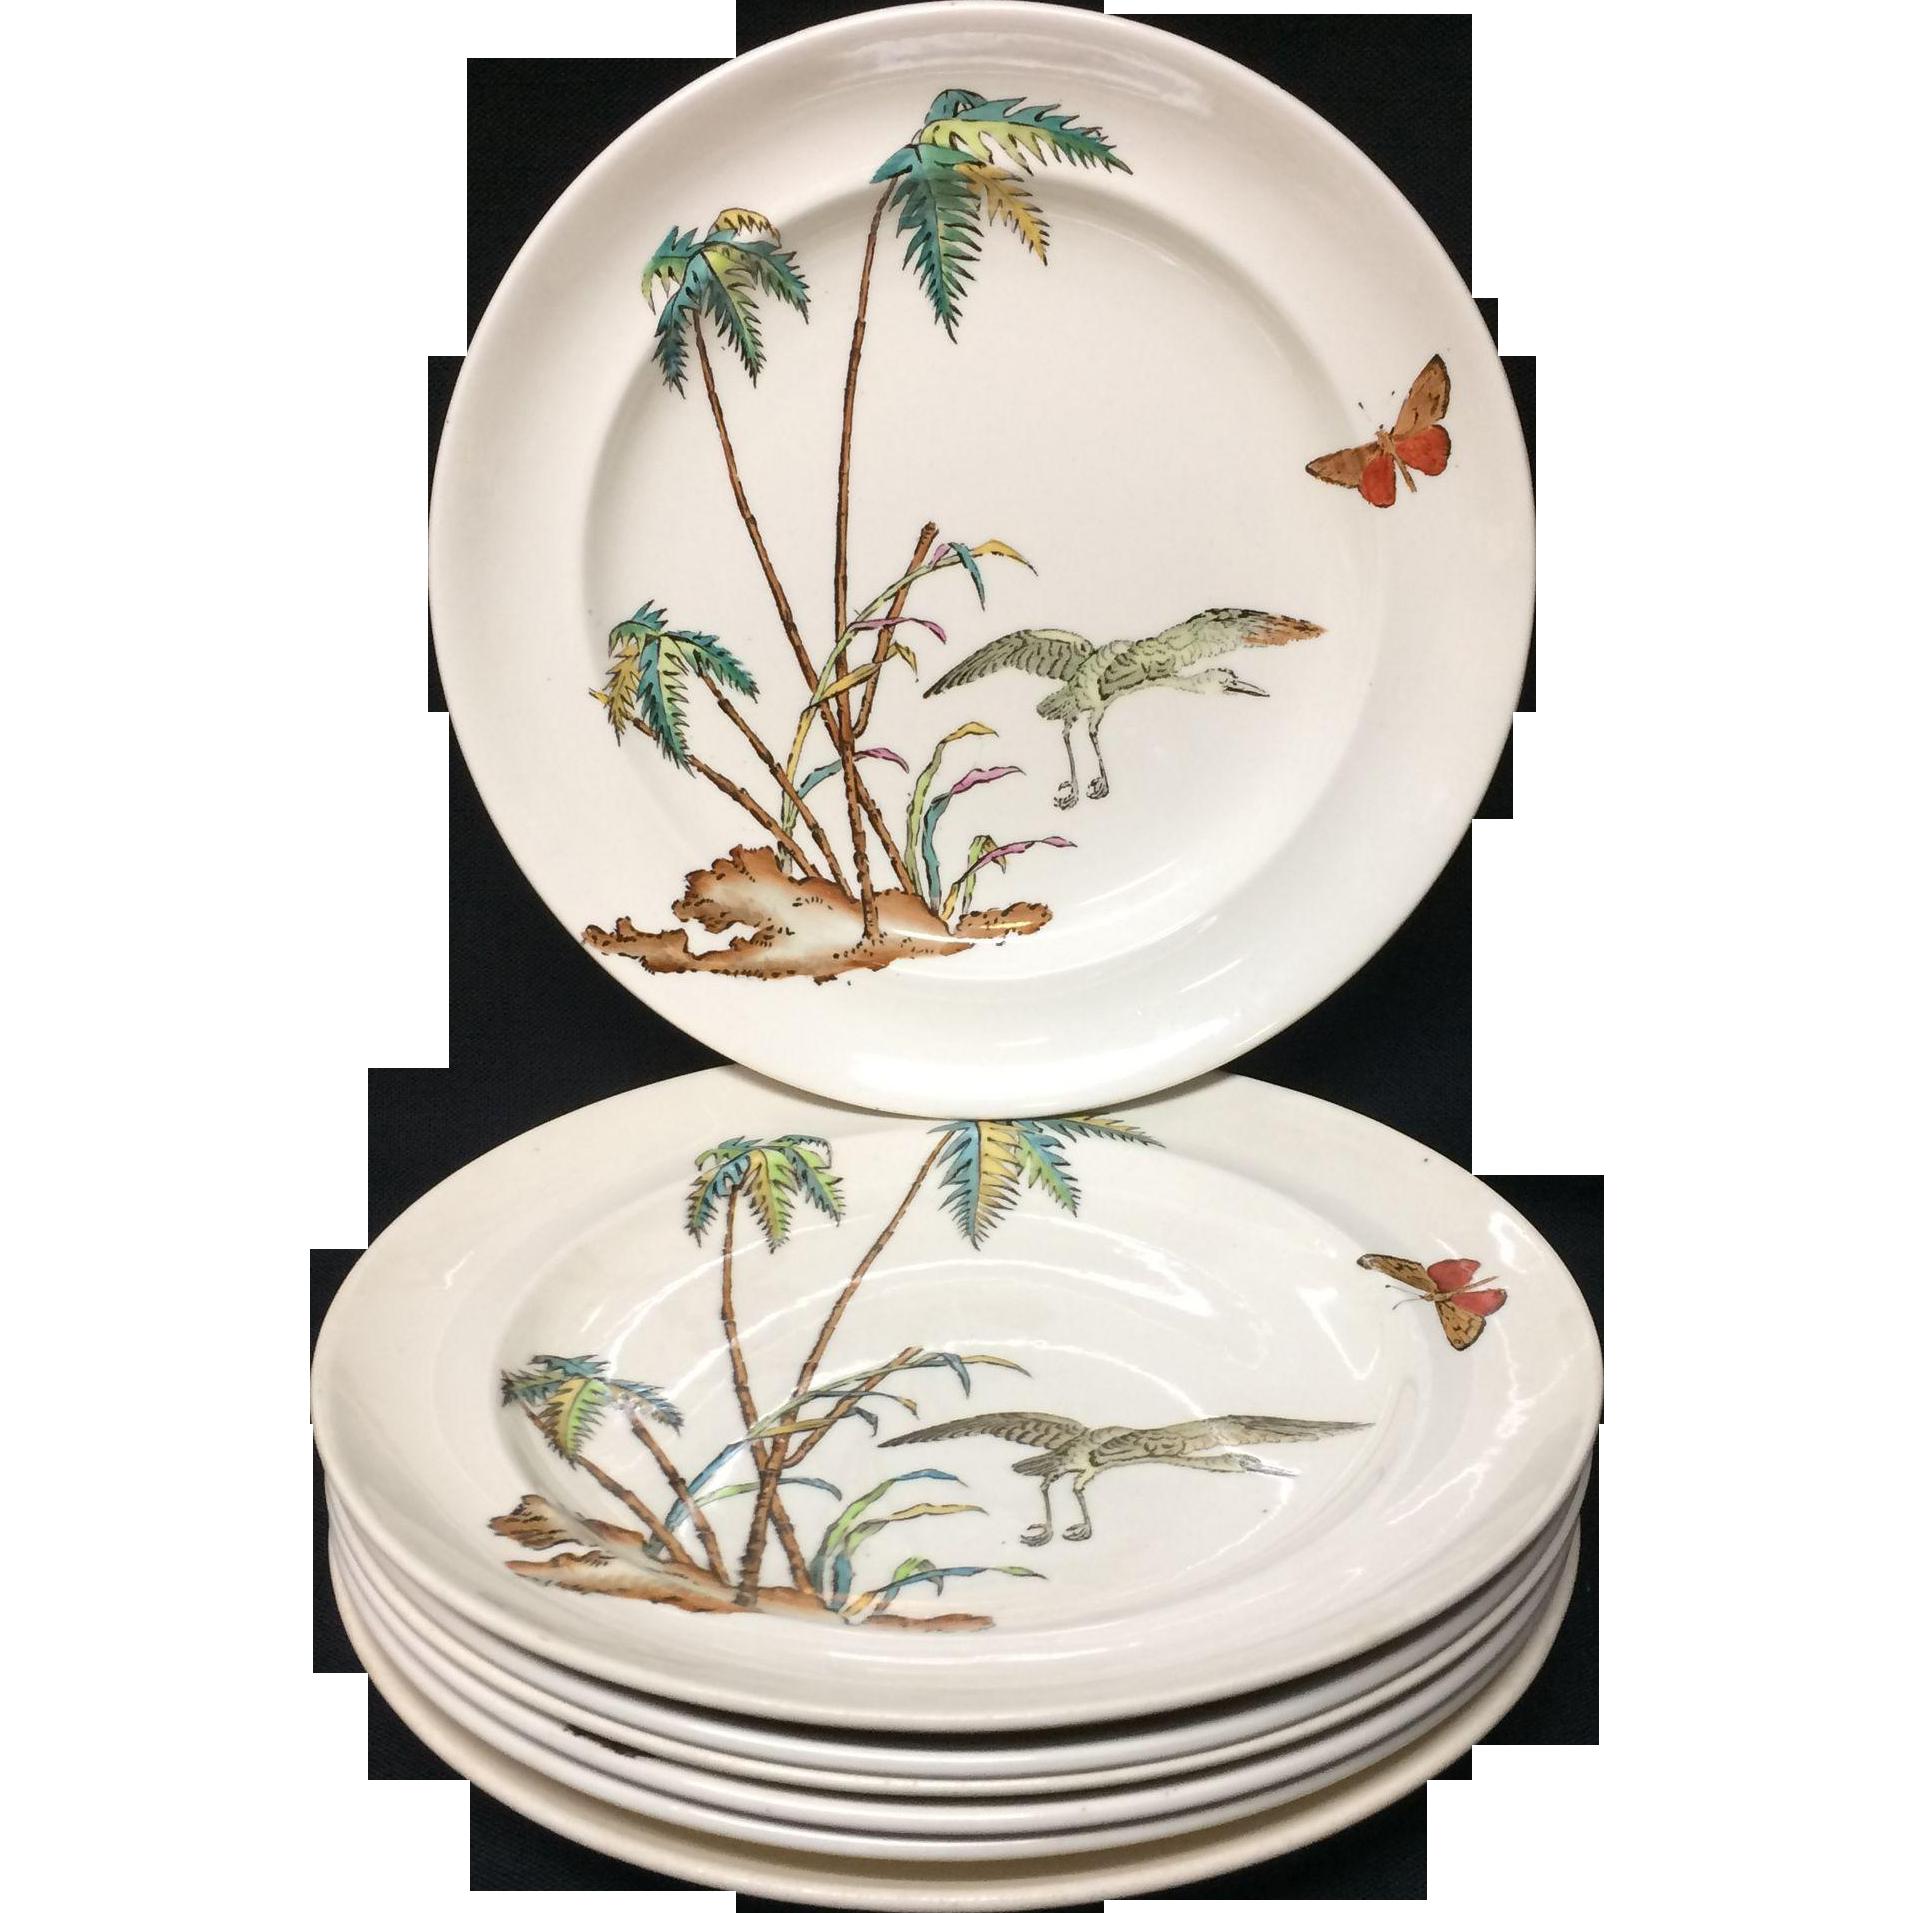 Early Copeland Exotic Polychrome 7 Plates ~ PALMS EGRET 1878